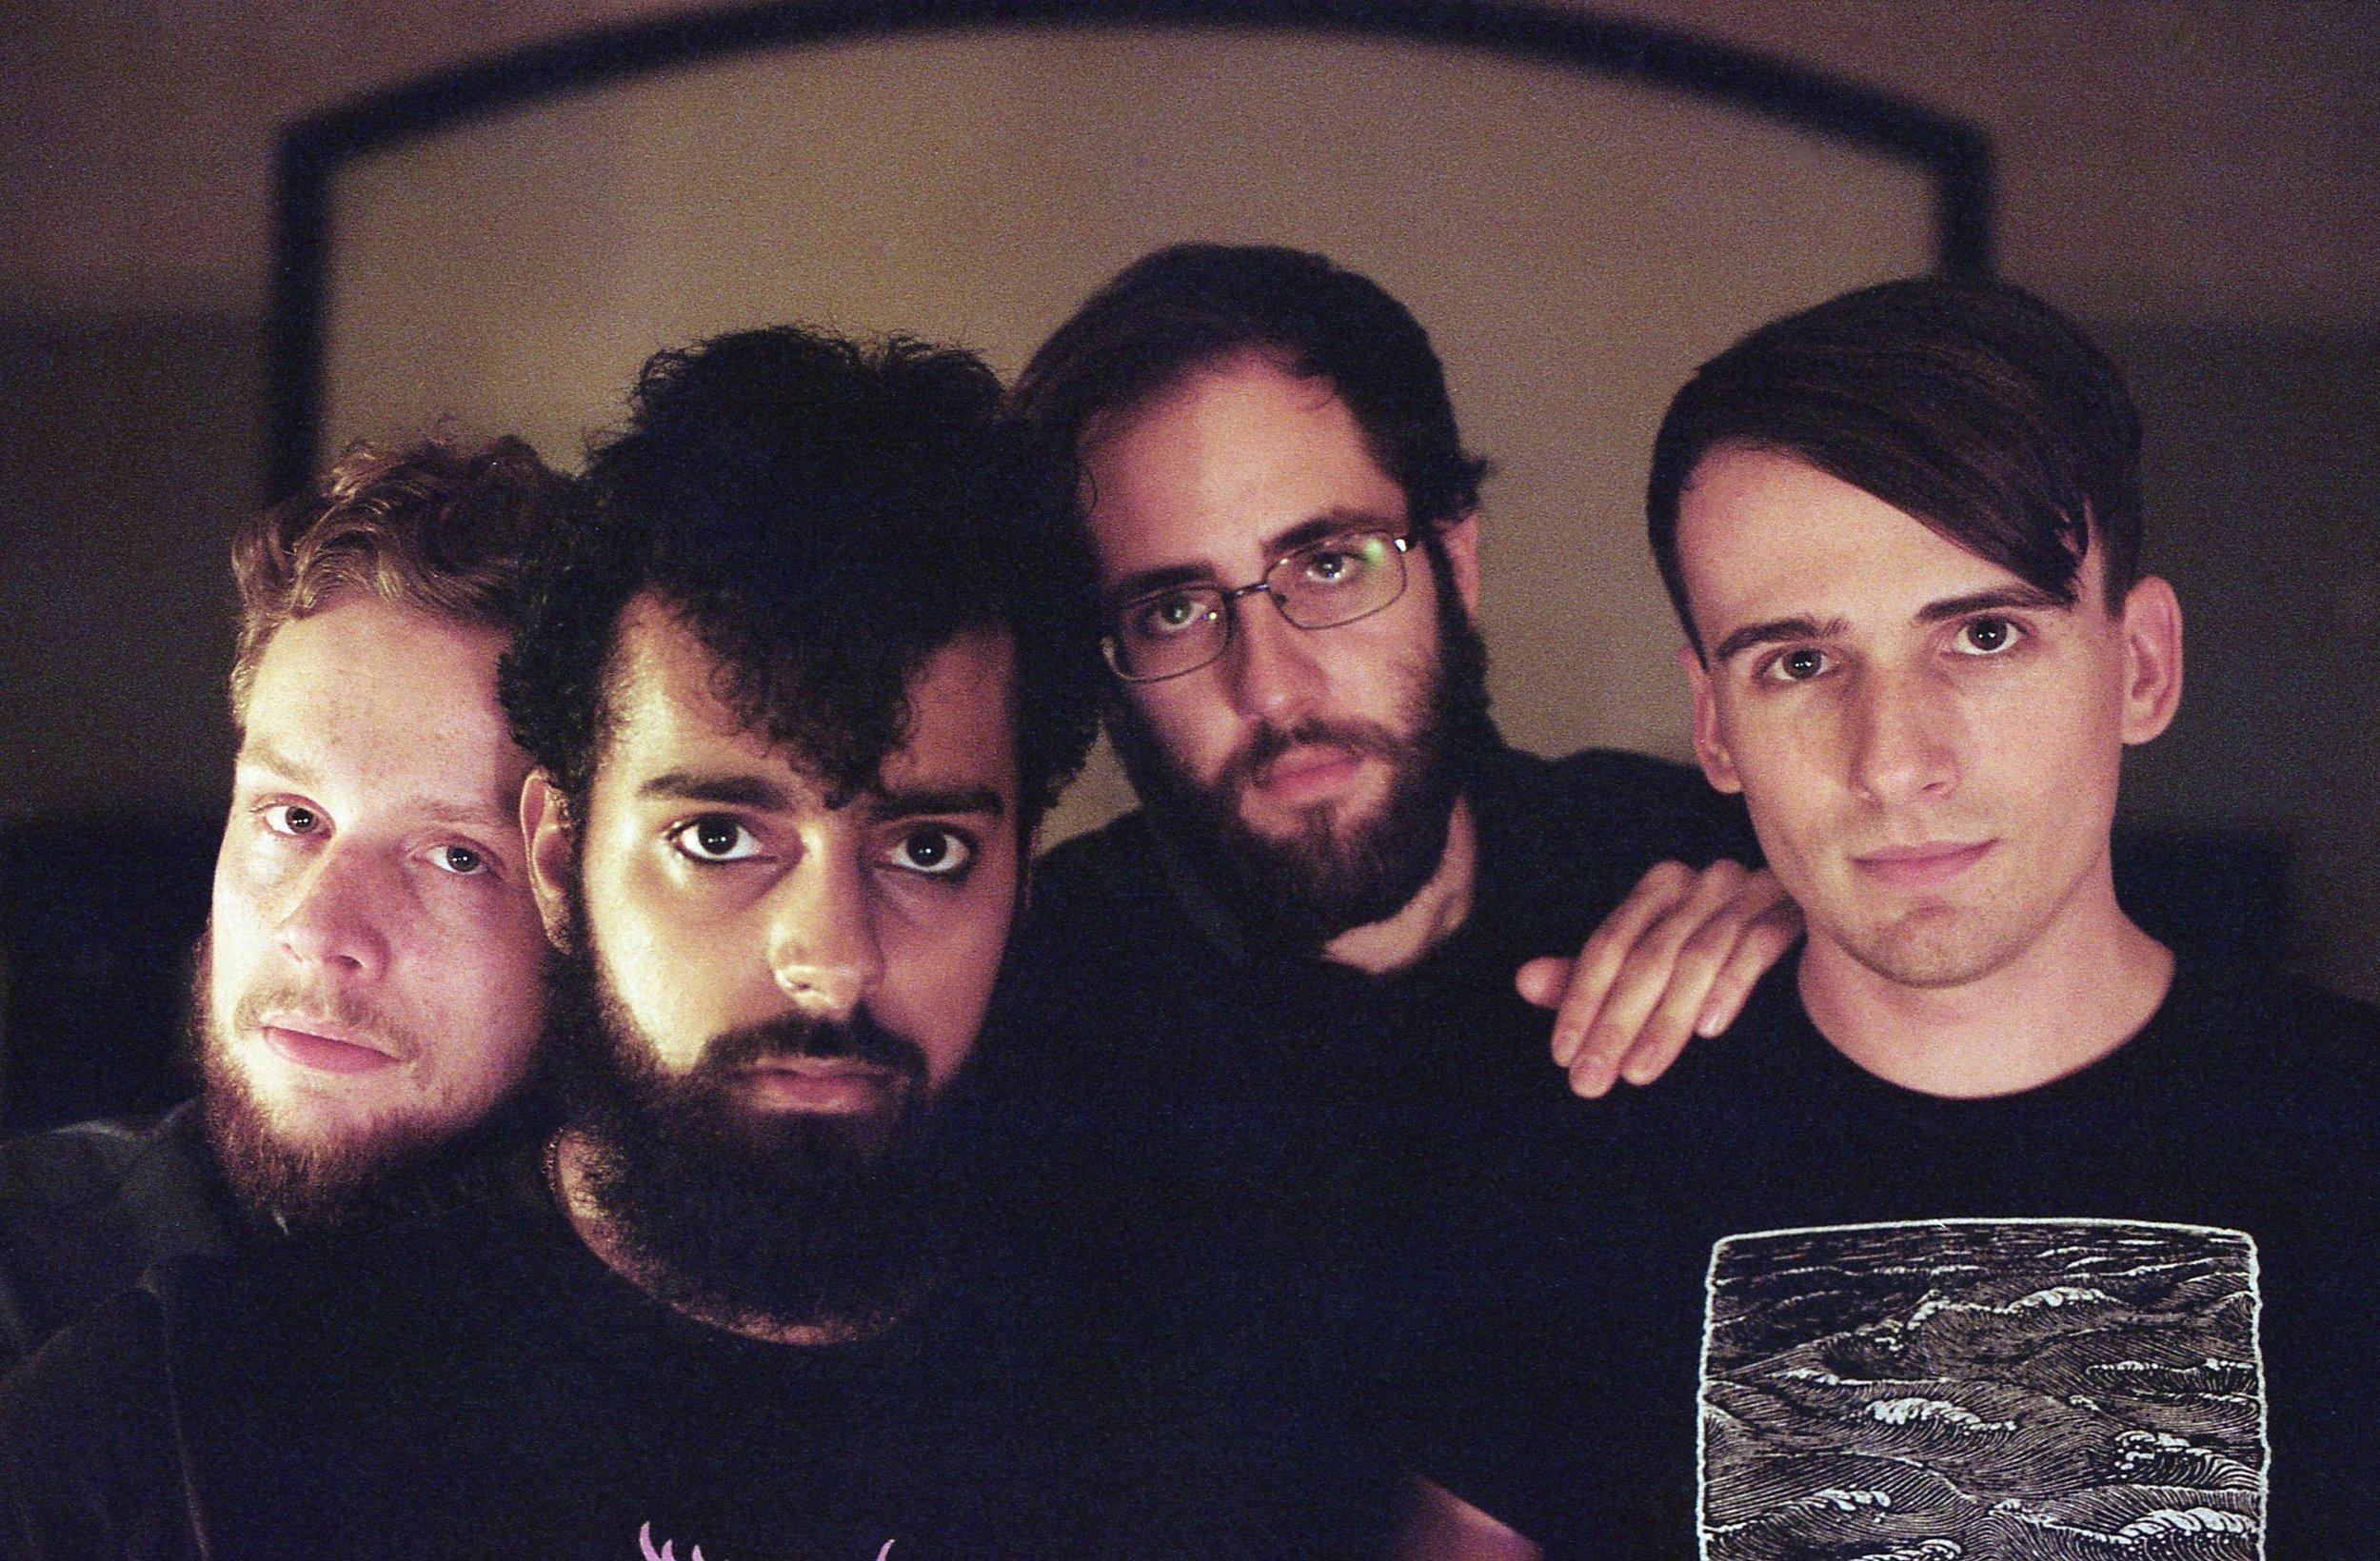 Straya (left to right): Mark, Sanjeev, Toby, & Cody // photo by Isabel Fajardo